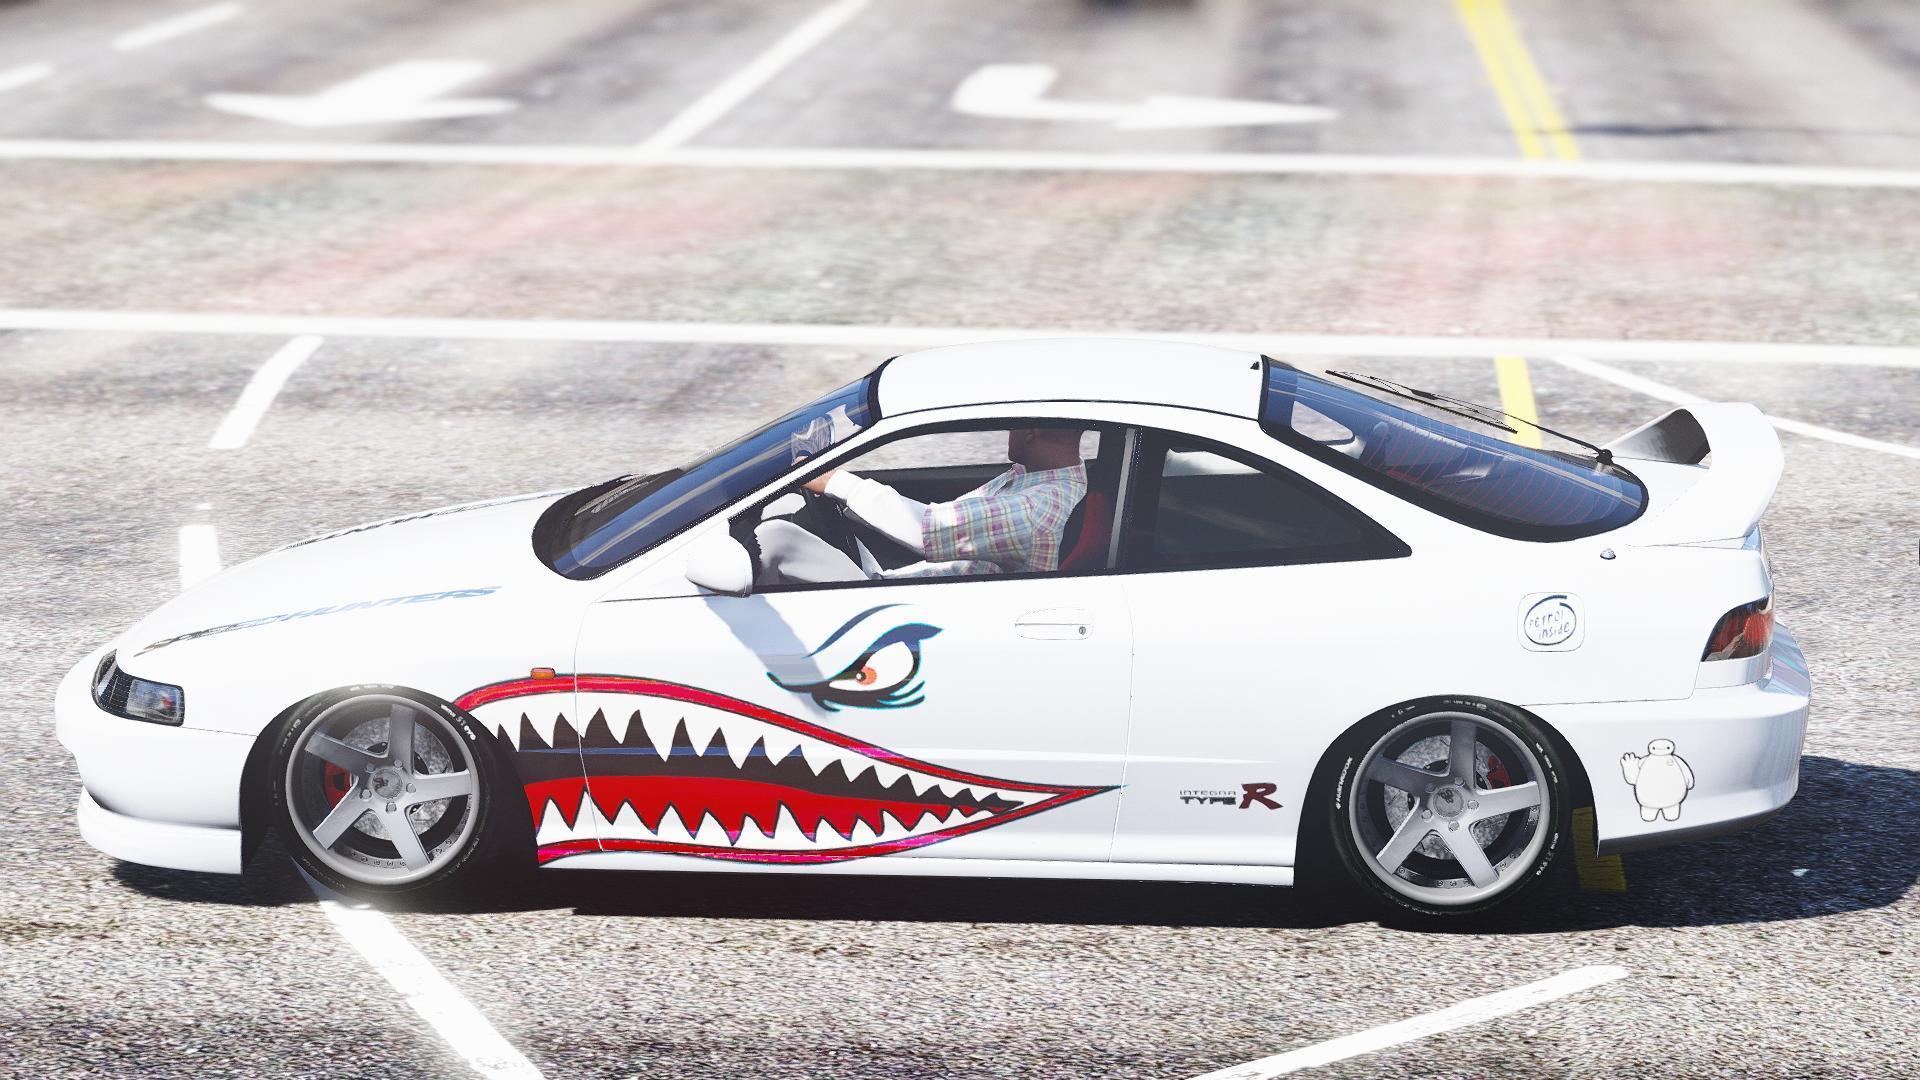 A Gta on Custom Acura Integra Type R